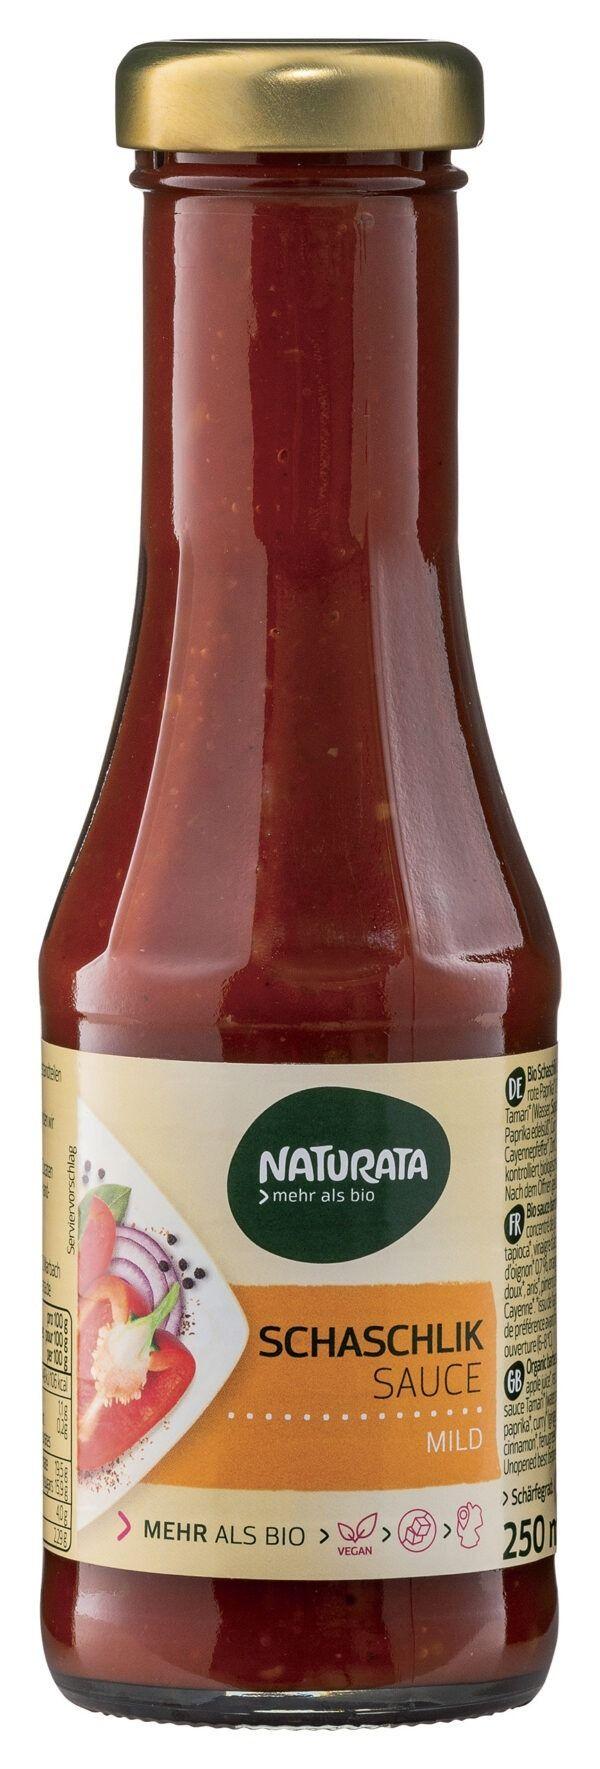 NATURATA Schaschlik Sauce 6x250ml